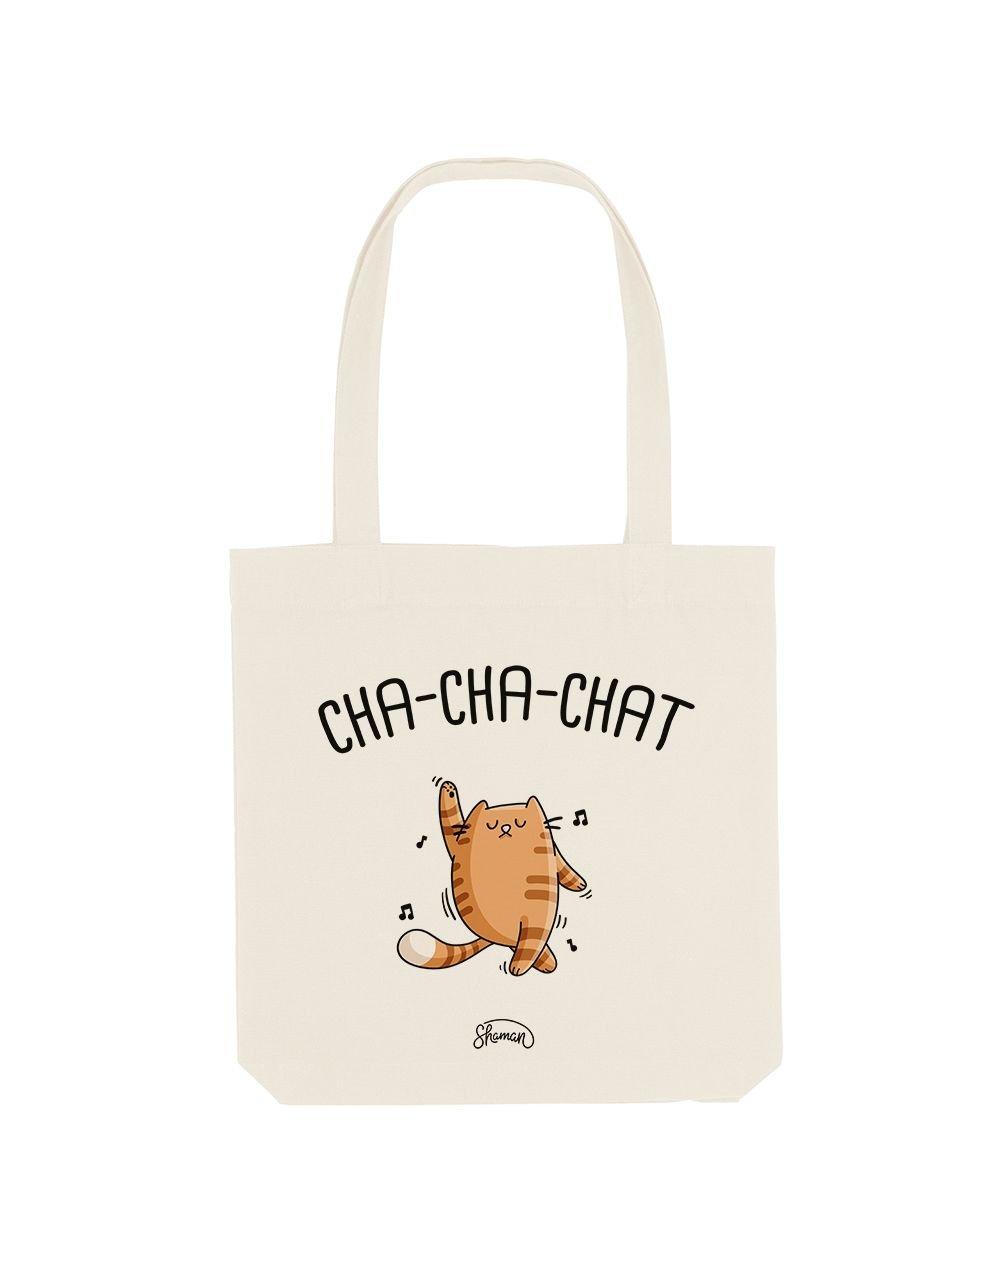 CHACHACHAT - Tote Bag  Crème  en coton